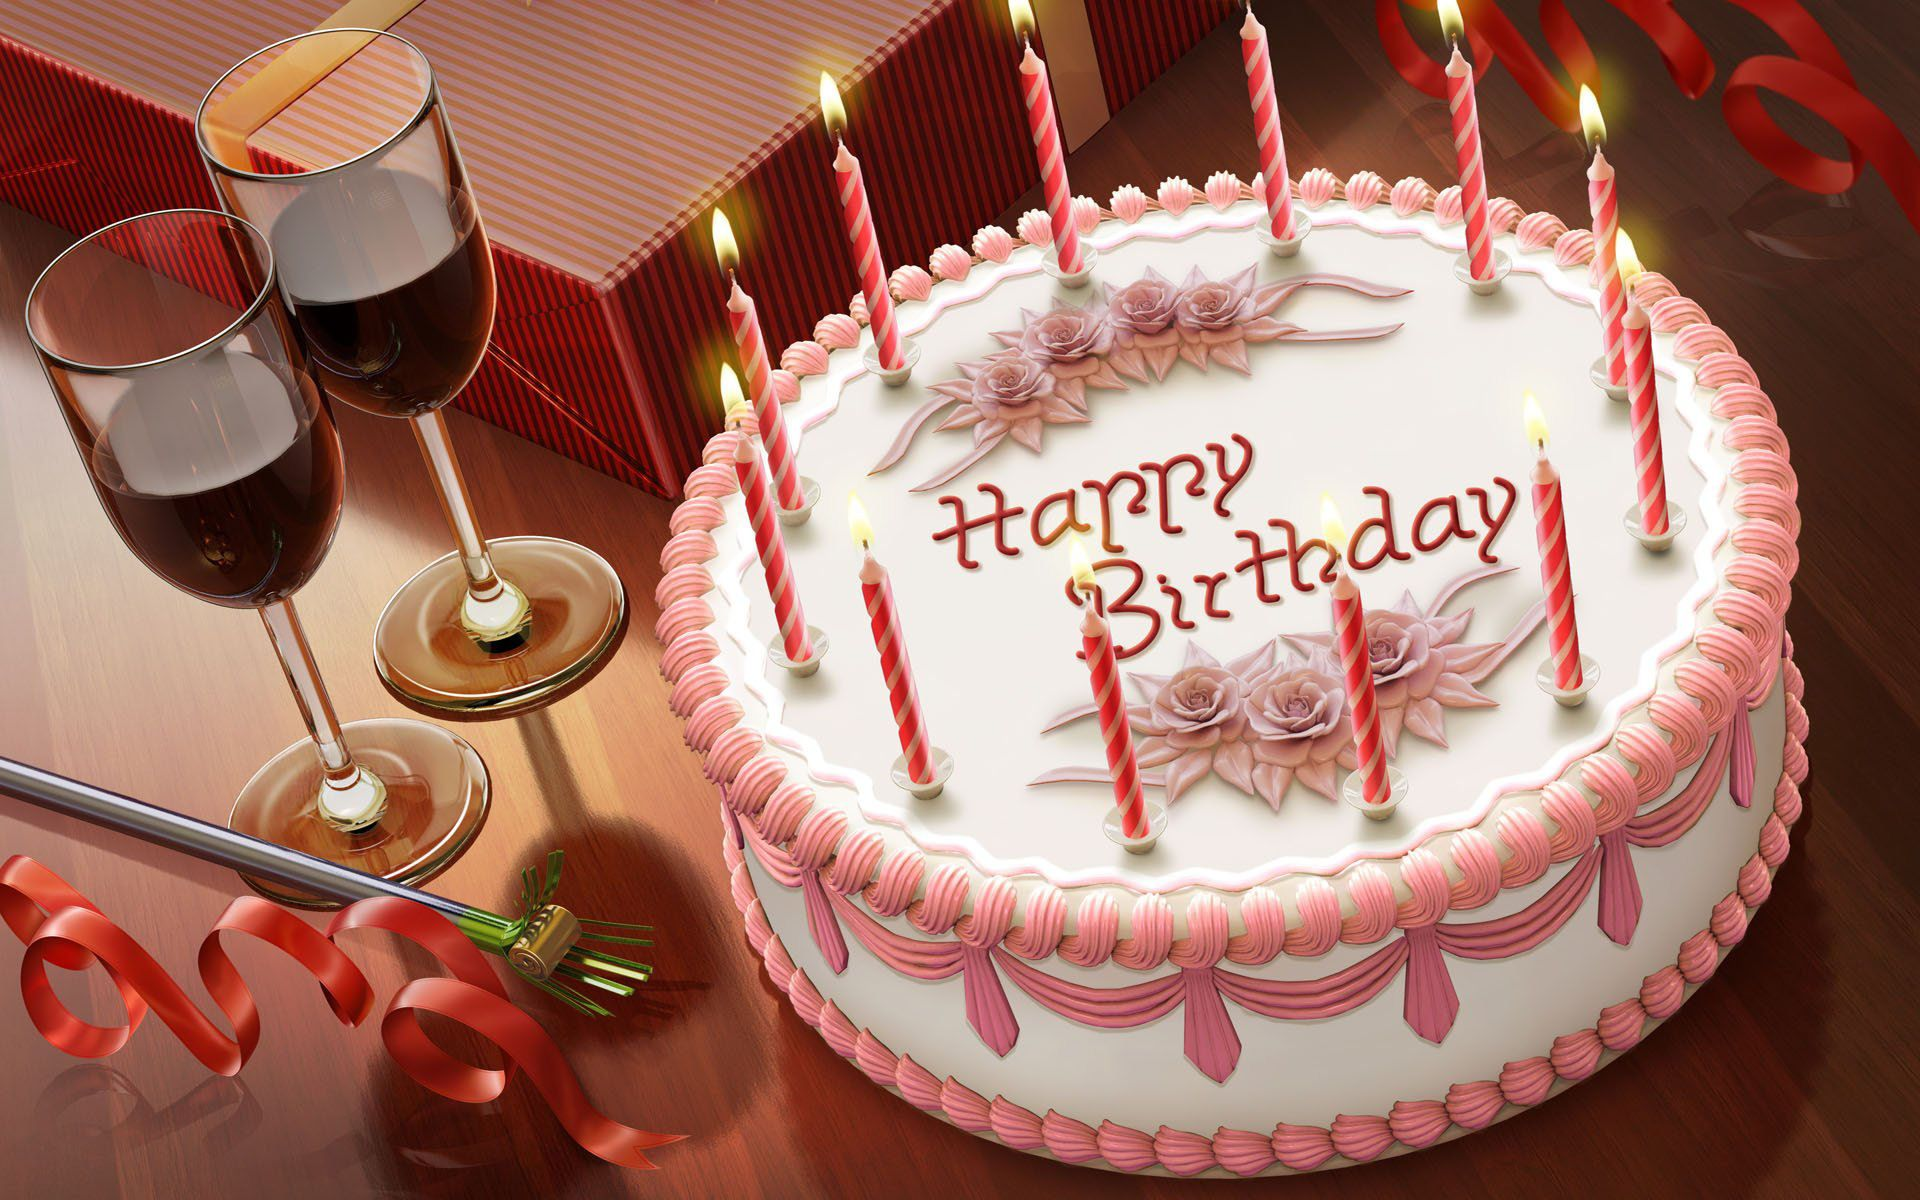 birthday birhday happy cake with name edit online come none on birthday cake with name edit online